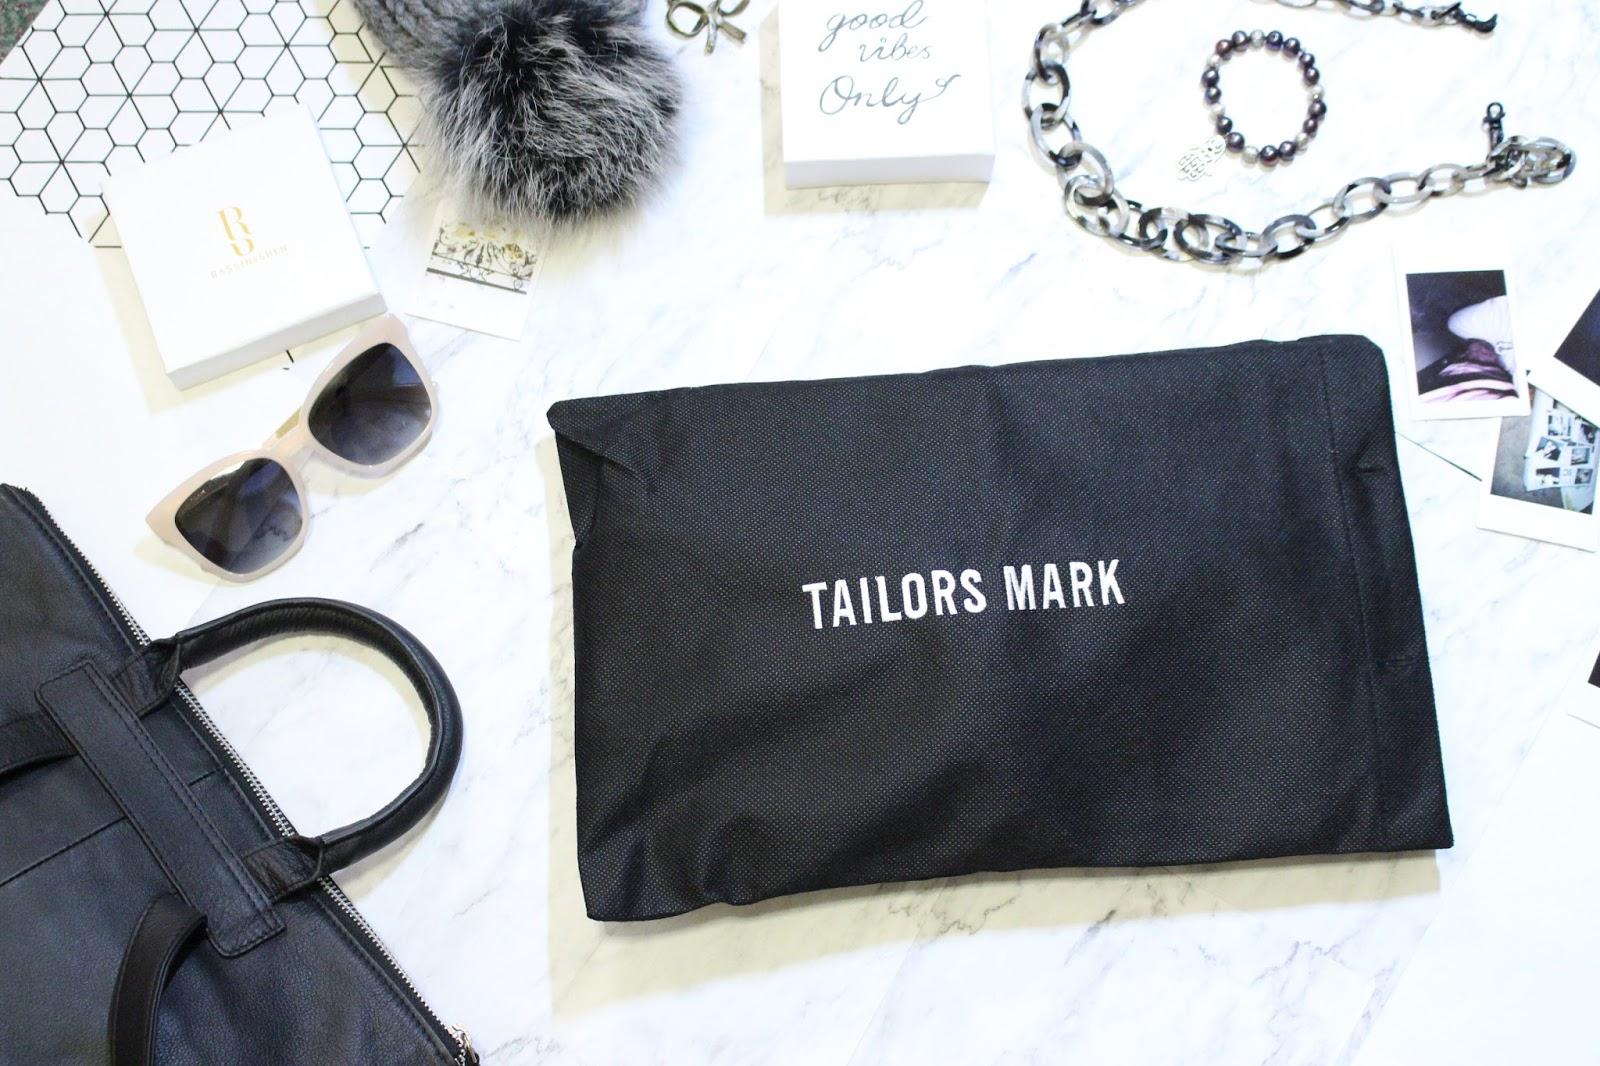 Fantail flo easter gift ideas for men tailors mark review tailors mark review tailors mark reviews tailors mark blog review tailors mark shirts negle Gallery